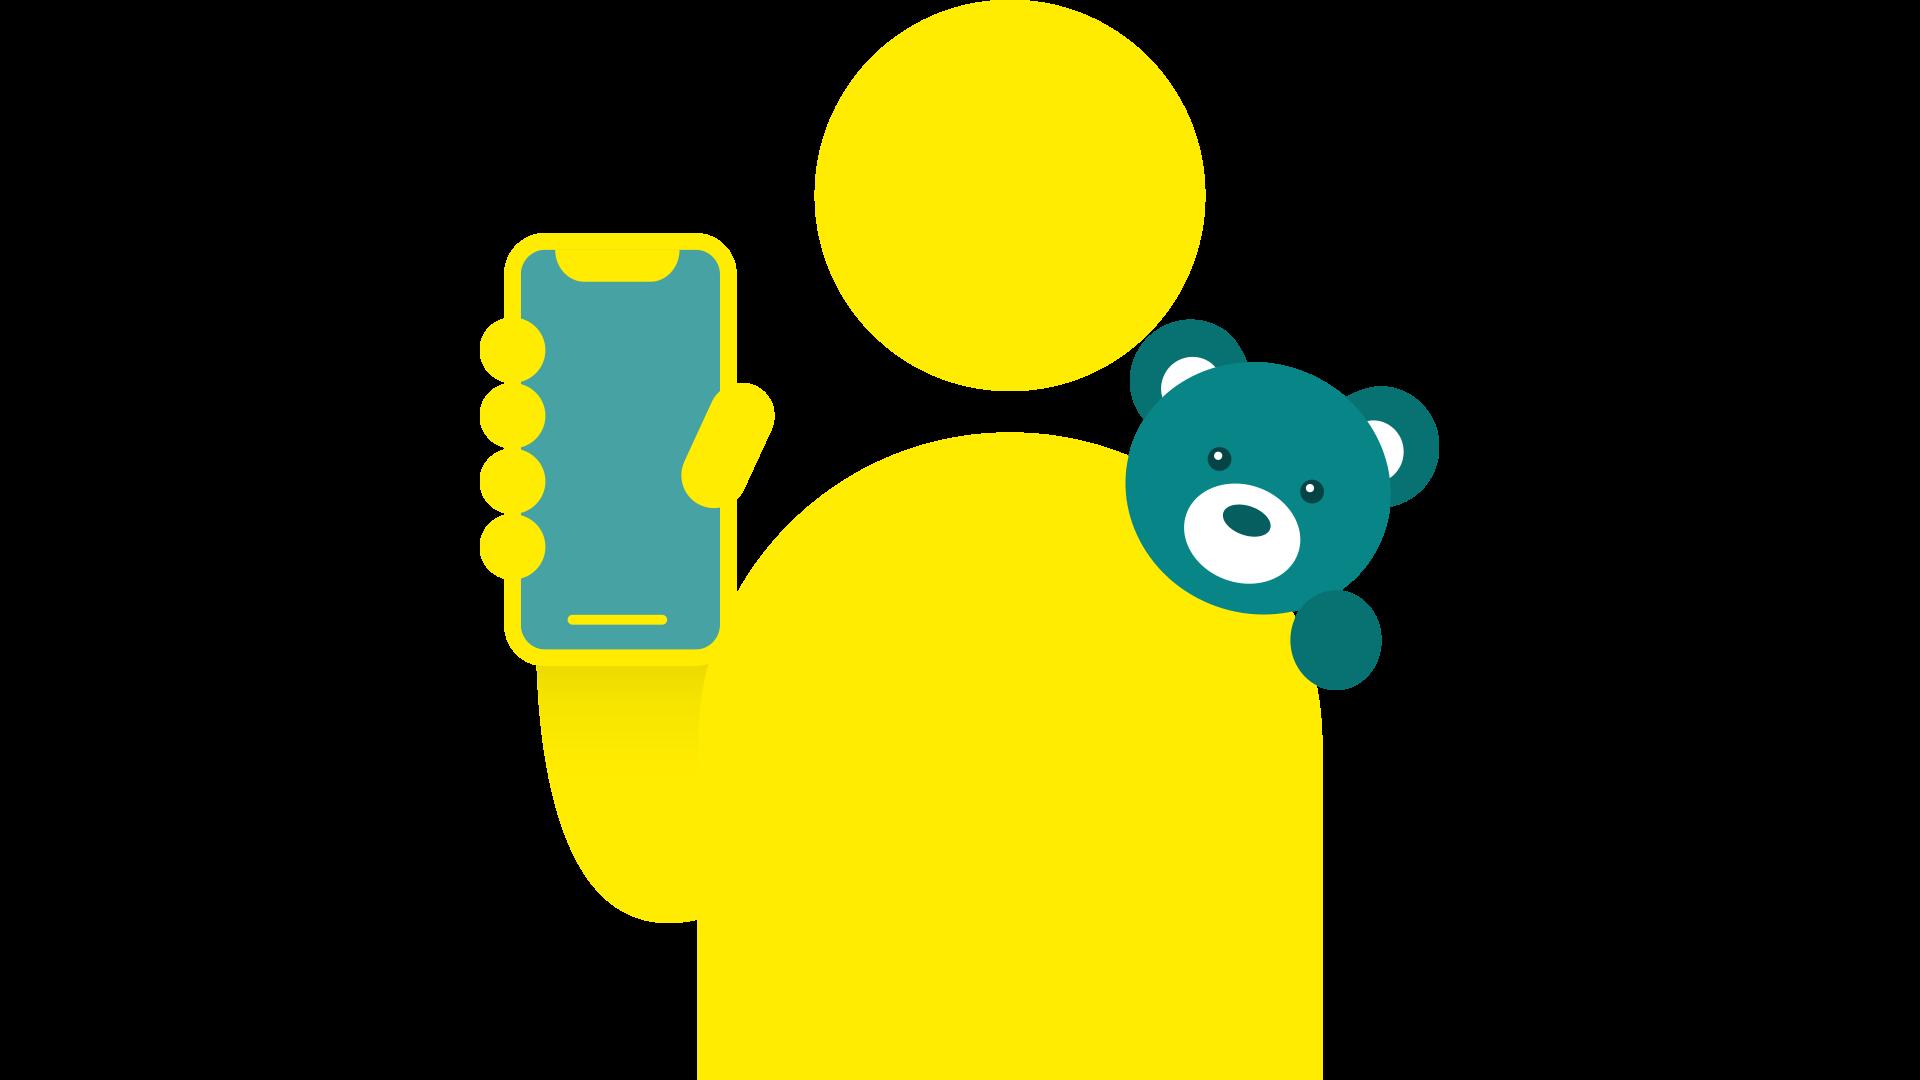 DAAS_Mobile_EndUser_Kids_yellow.png